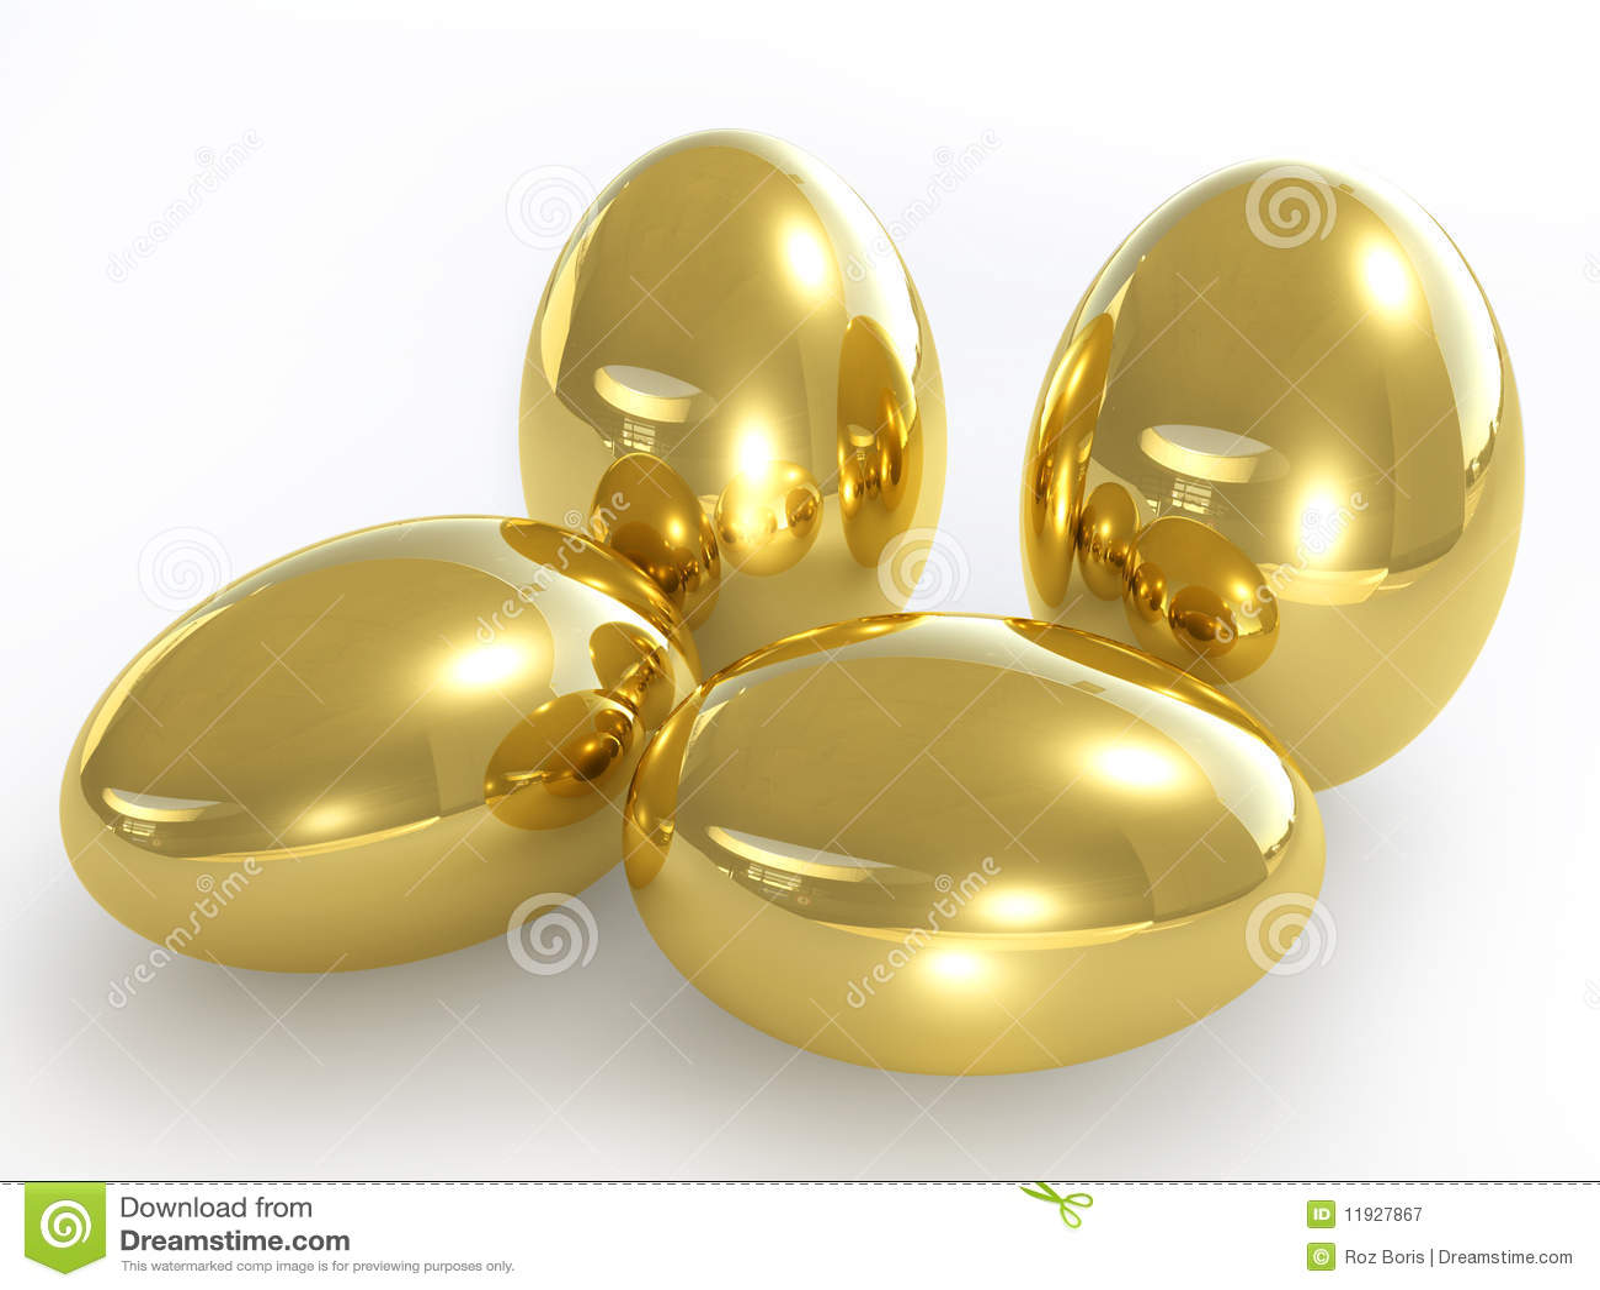 3d Colour Wallpaper Free Download Golden Eggs Stock Illustration Image Of Present Golden